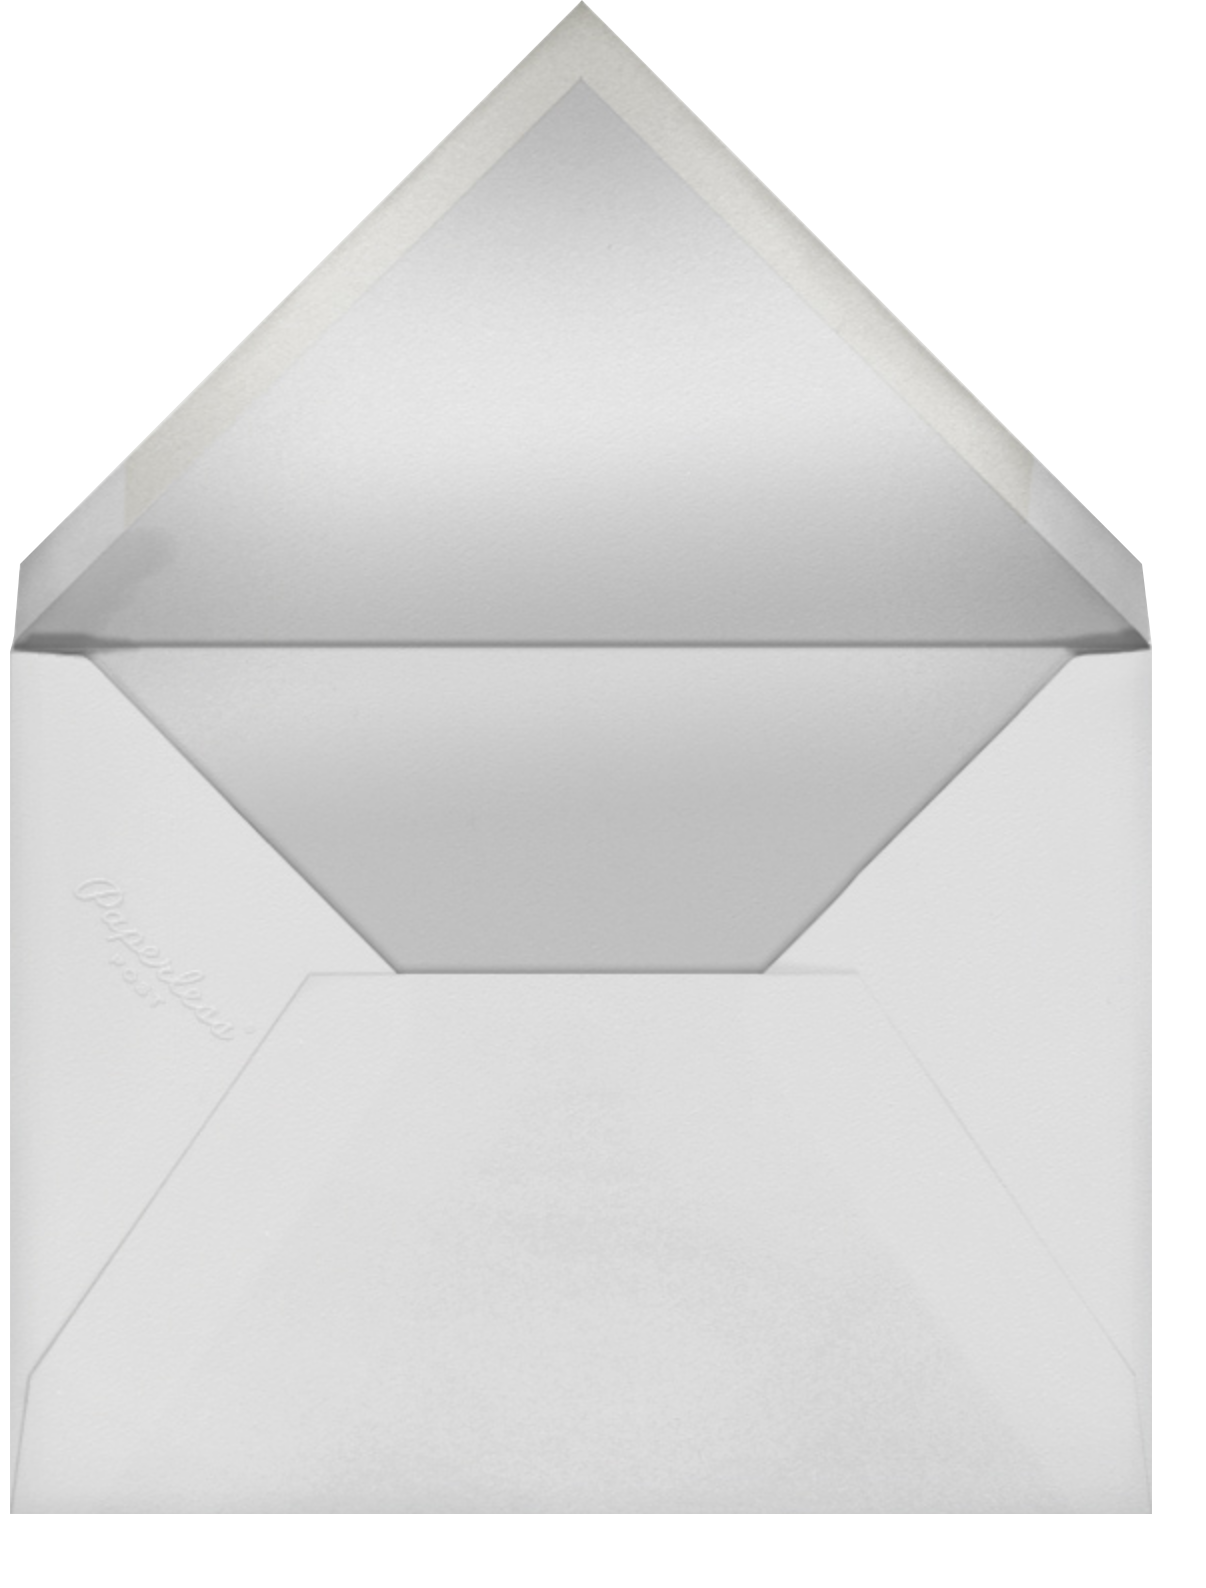 Benares (Program) - Bright Pink - Paperless Post - Menus and programs - envelope back